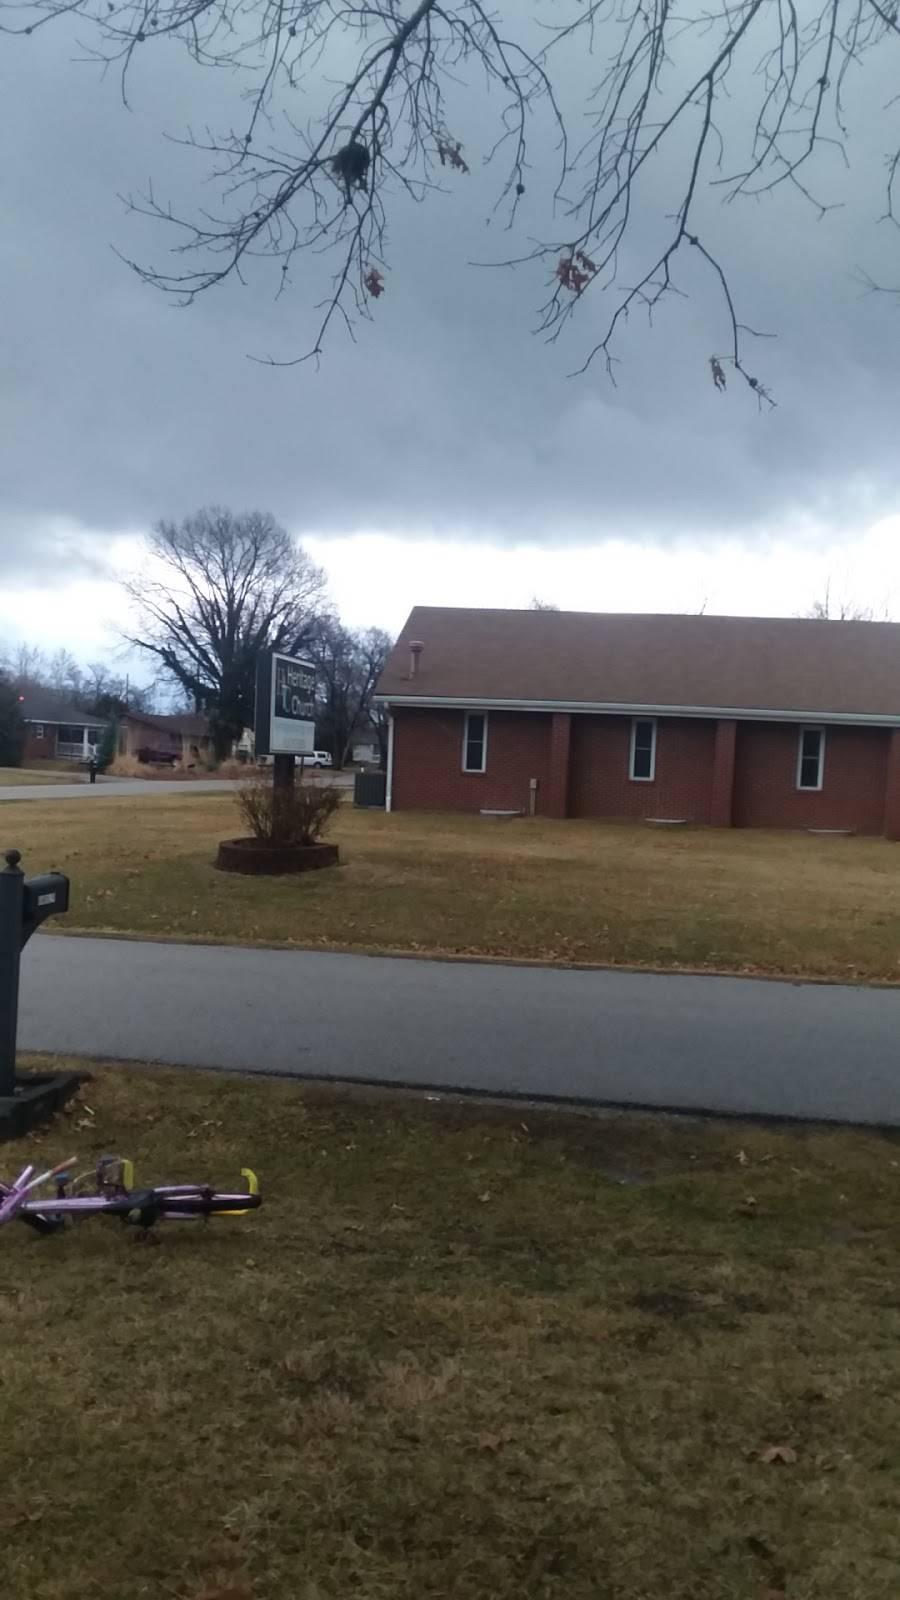 Cedar View General Baptist Church - church  | Photo 3 of 9 | Address: 3716 Ruth Dr, Granite City, IL 62040, USA | Phone: (618) 931-5330